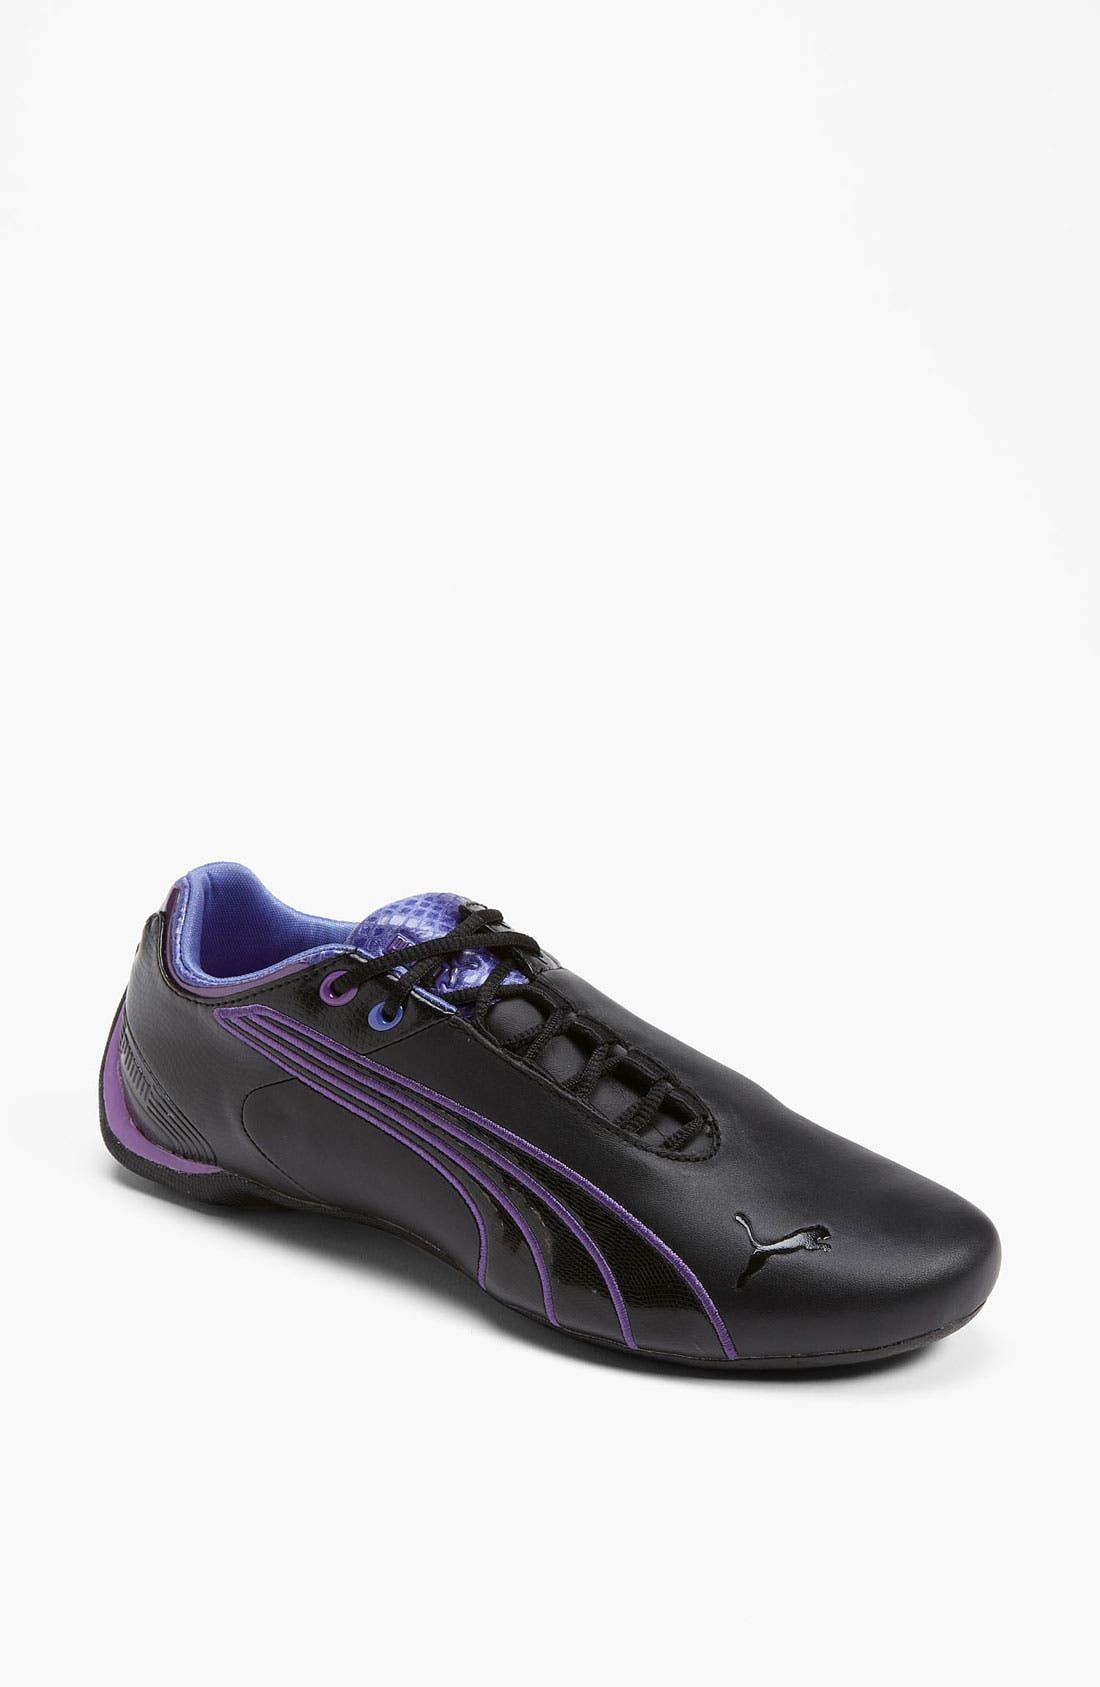 Alternate Image 1 Selected - PUMA 'Future Cat M2 Weave' Sneaker (Women)